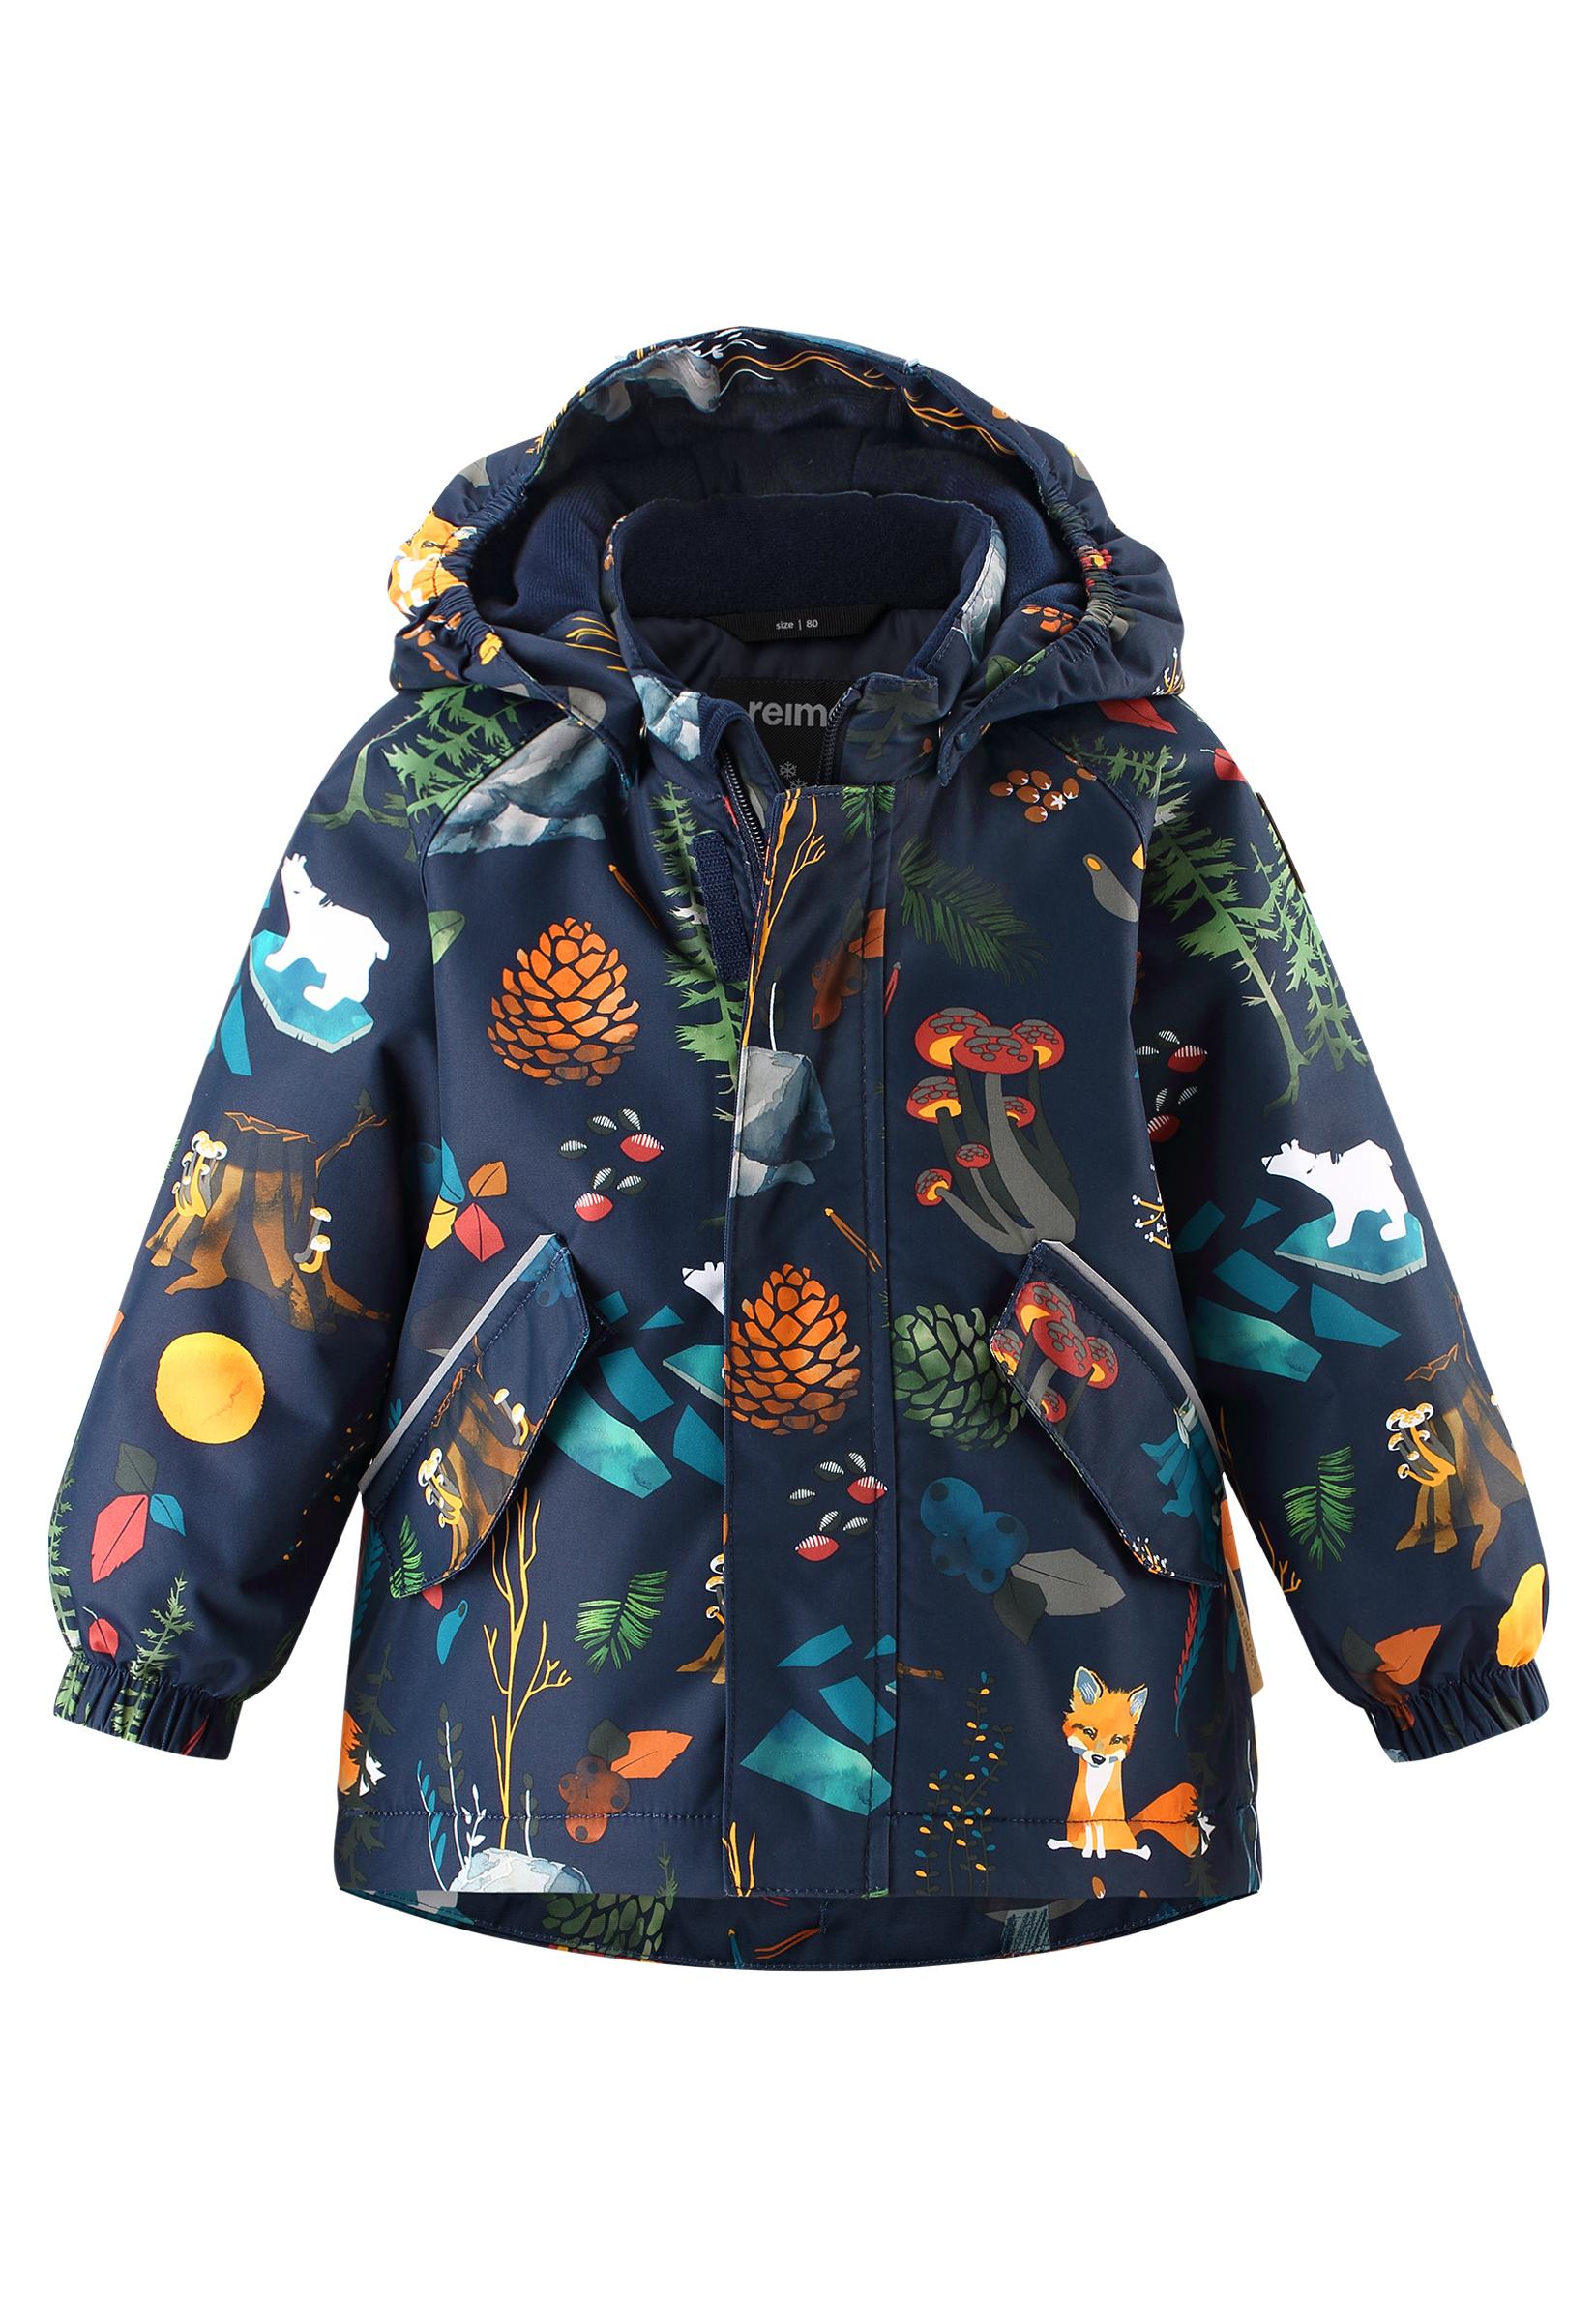 Reima Antamois - Navy detska zimna nepremokava bunda